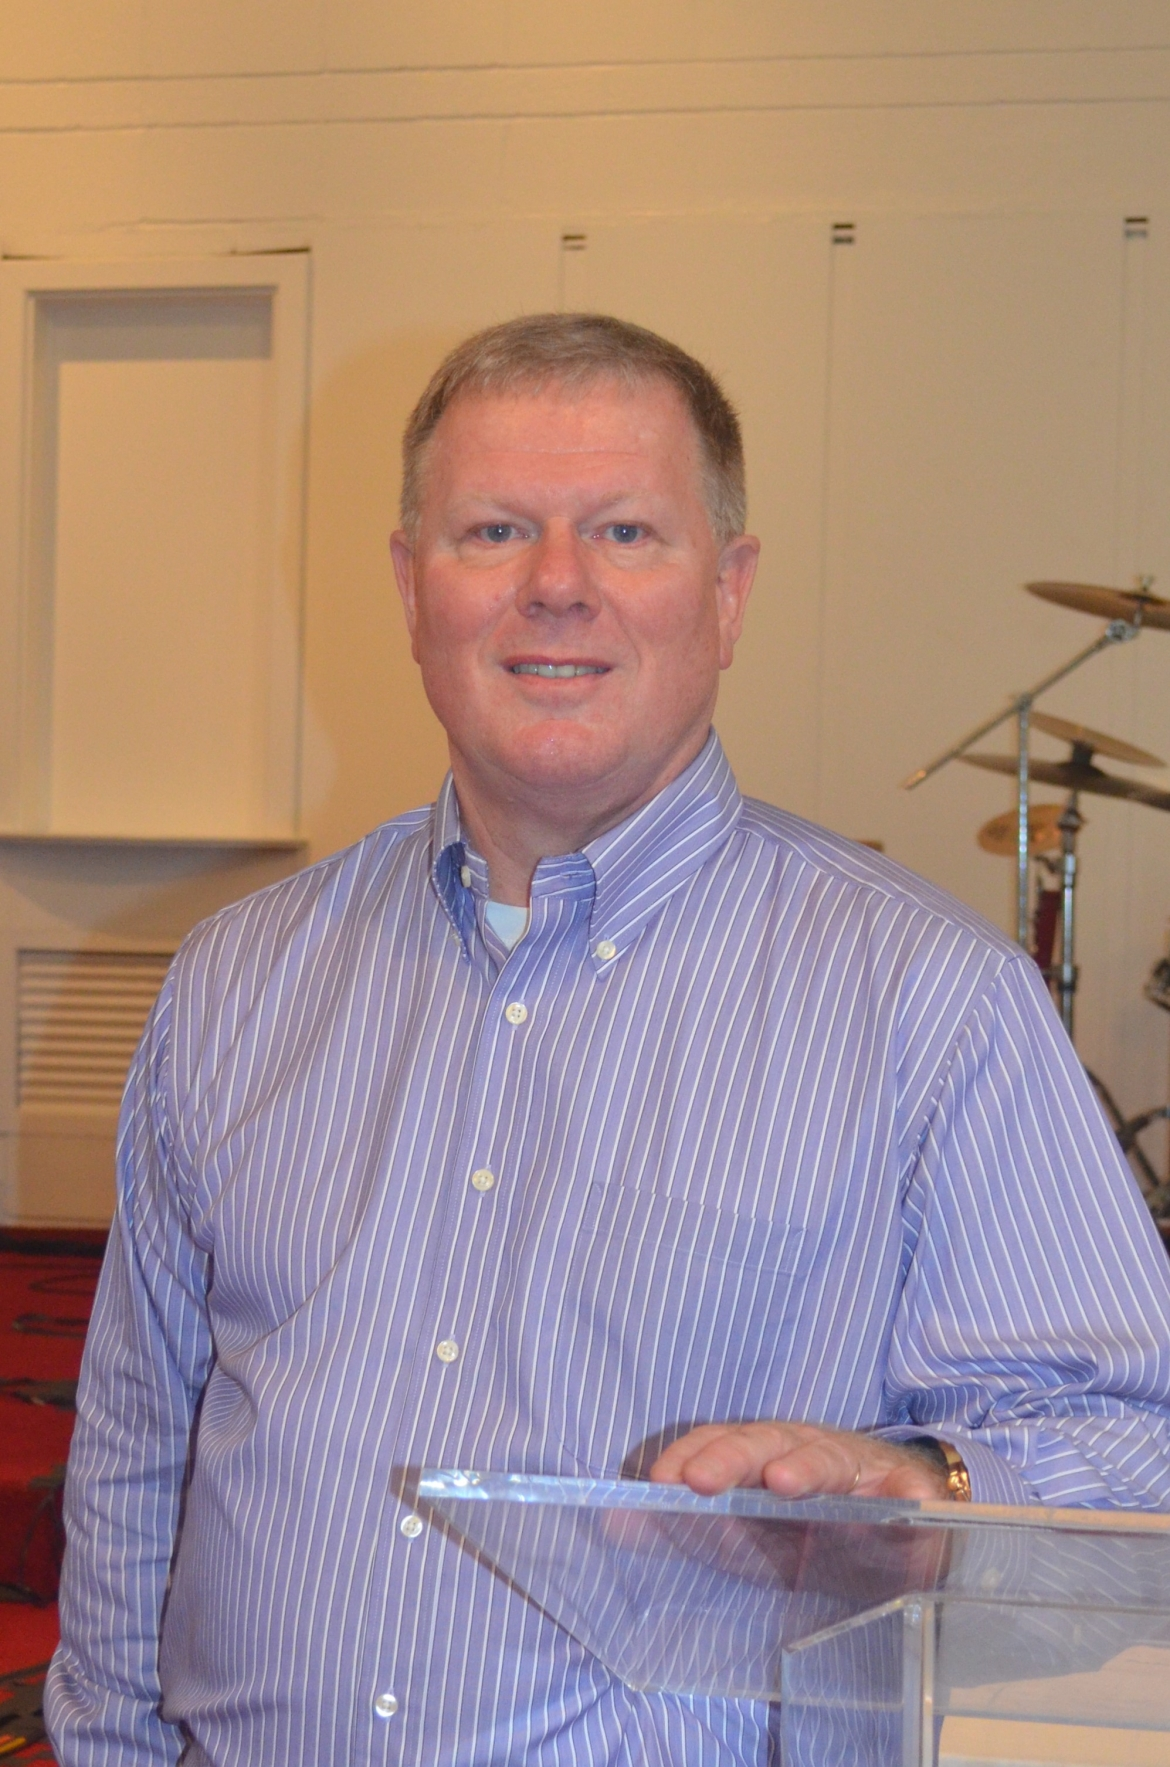 Pastor Wayne Fox